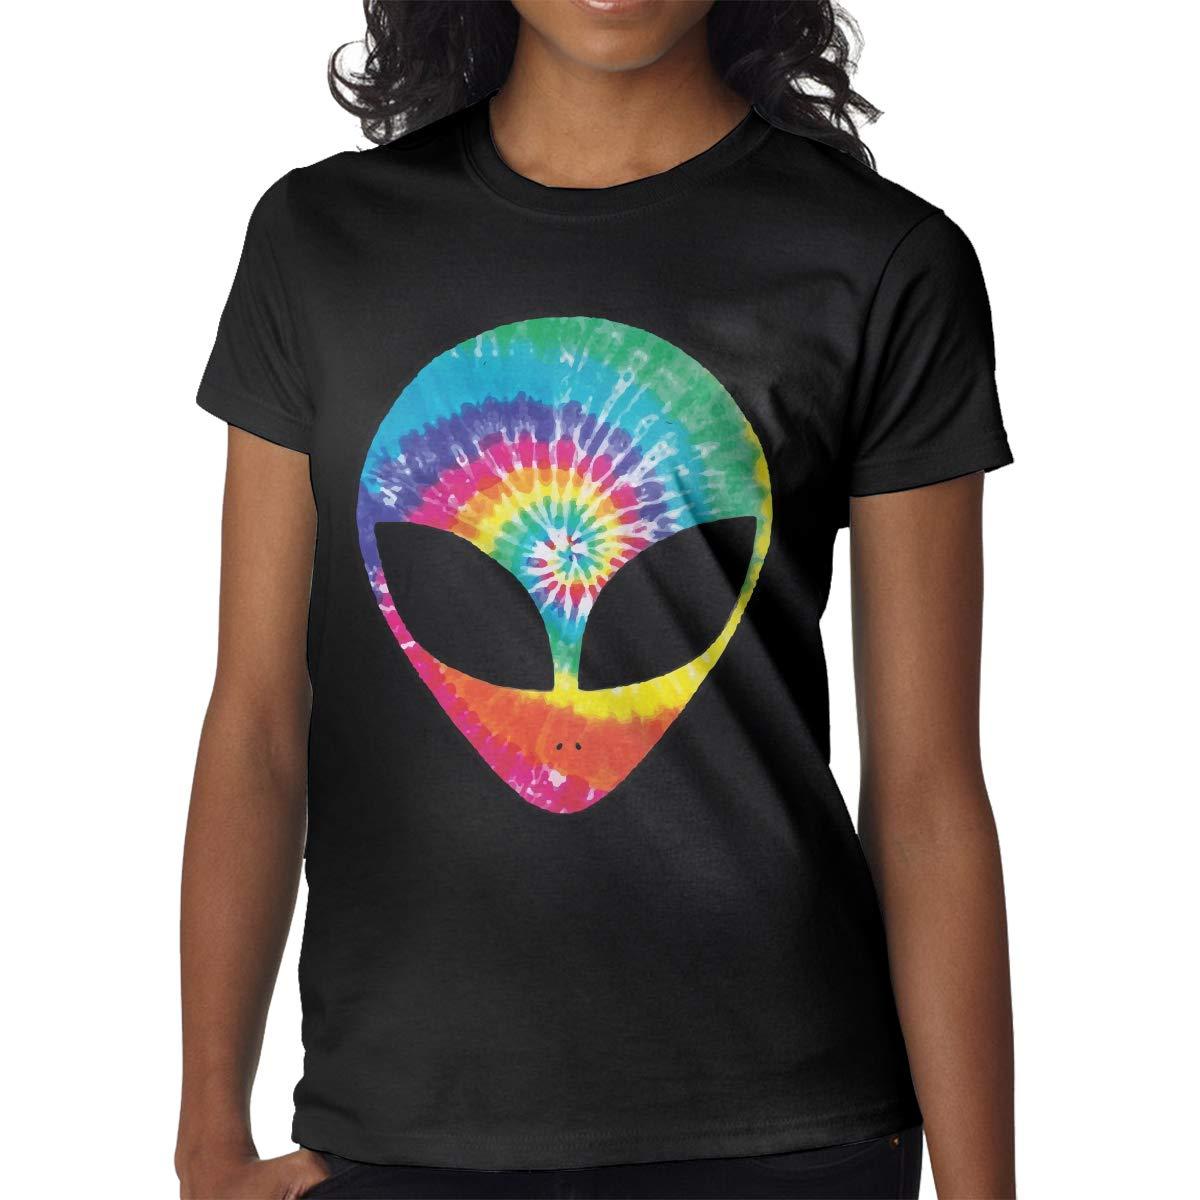 Rainbow Tie Dye Alien Head 2-6 Years Old Children Short-Sleeved Tshirts